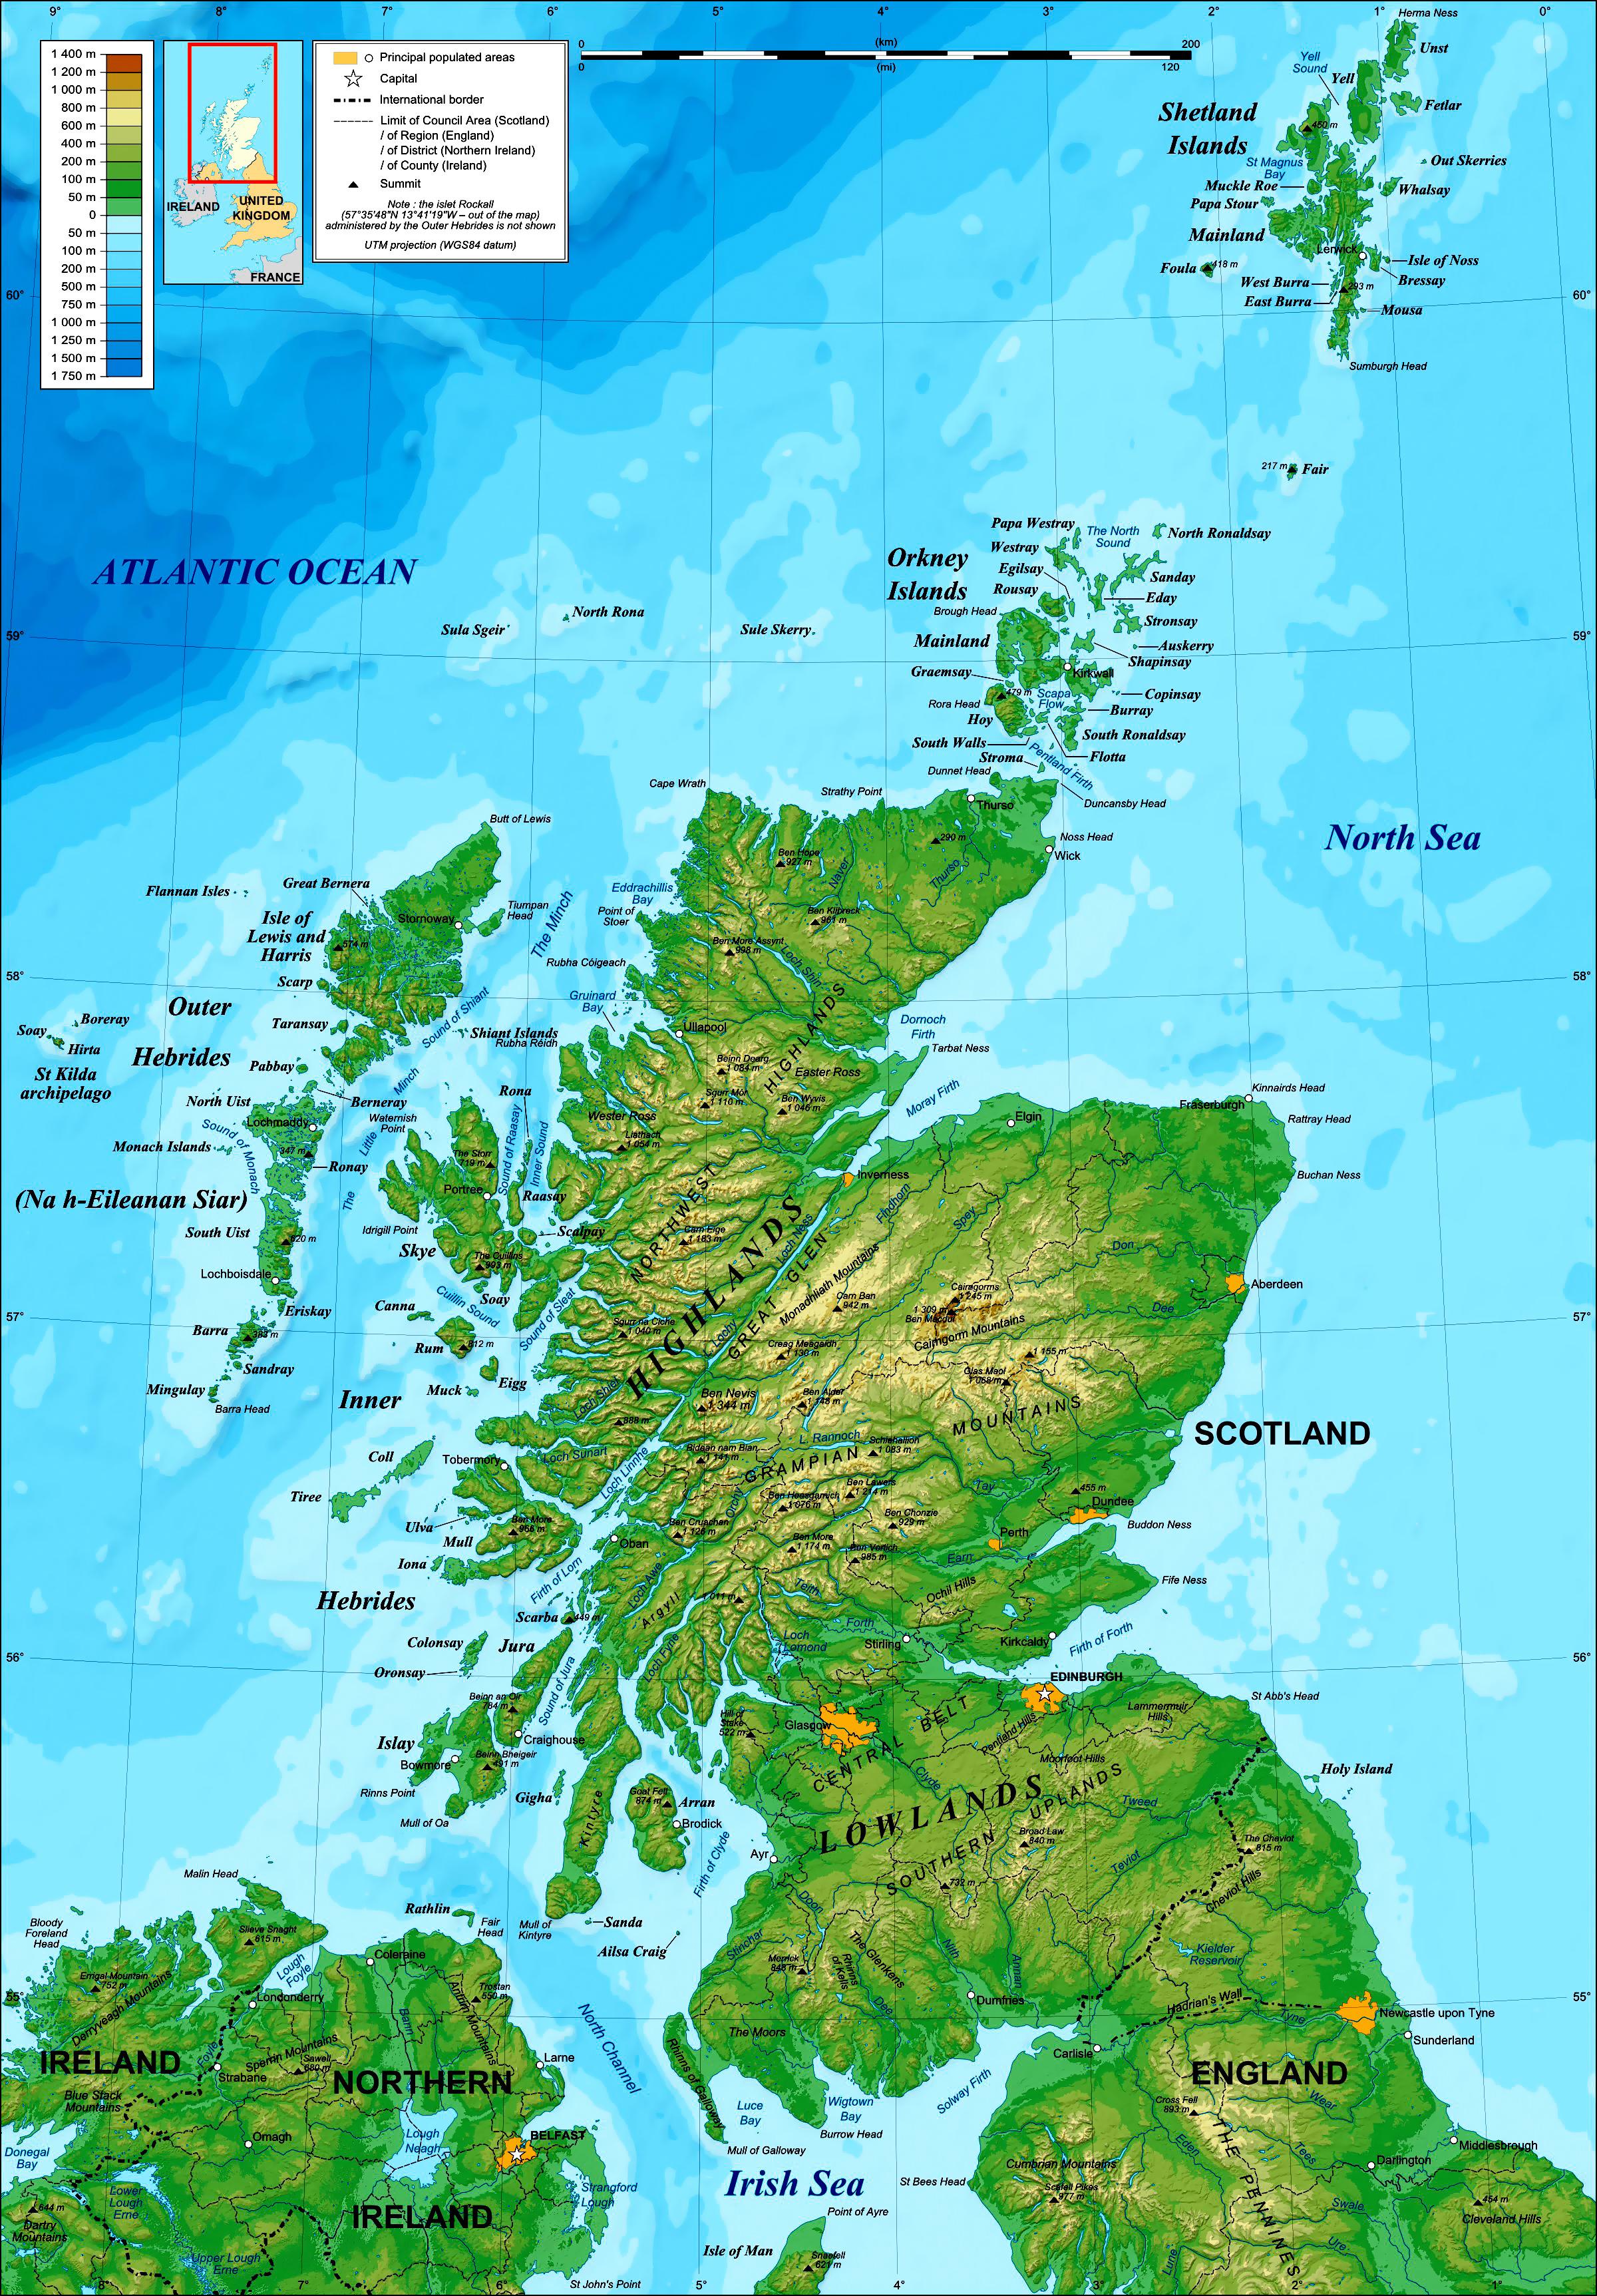 Grande Detallado Mapa Topografico De Escocia Escocia Reino